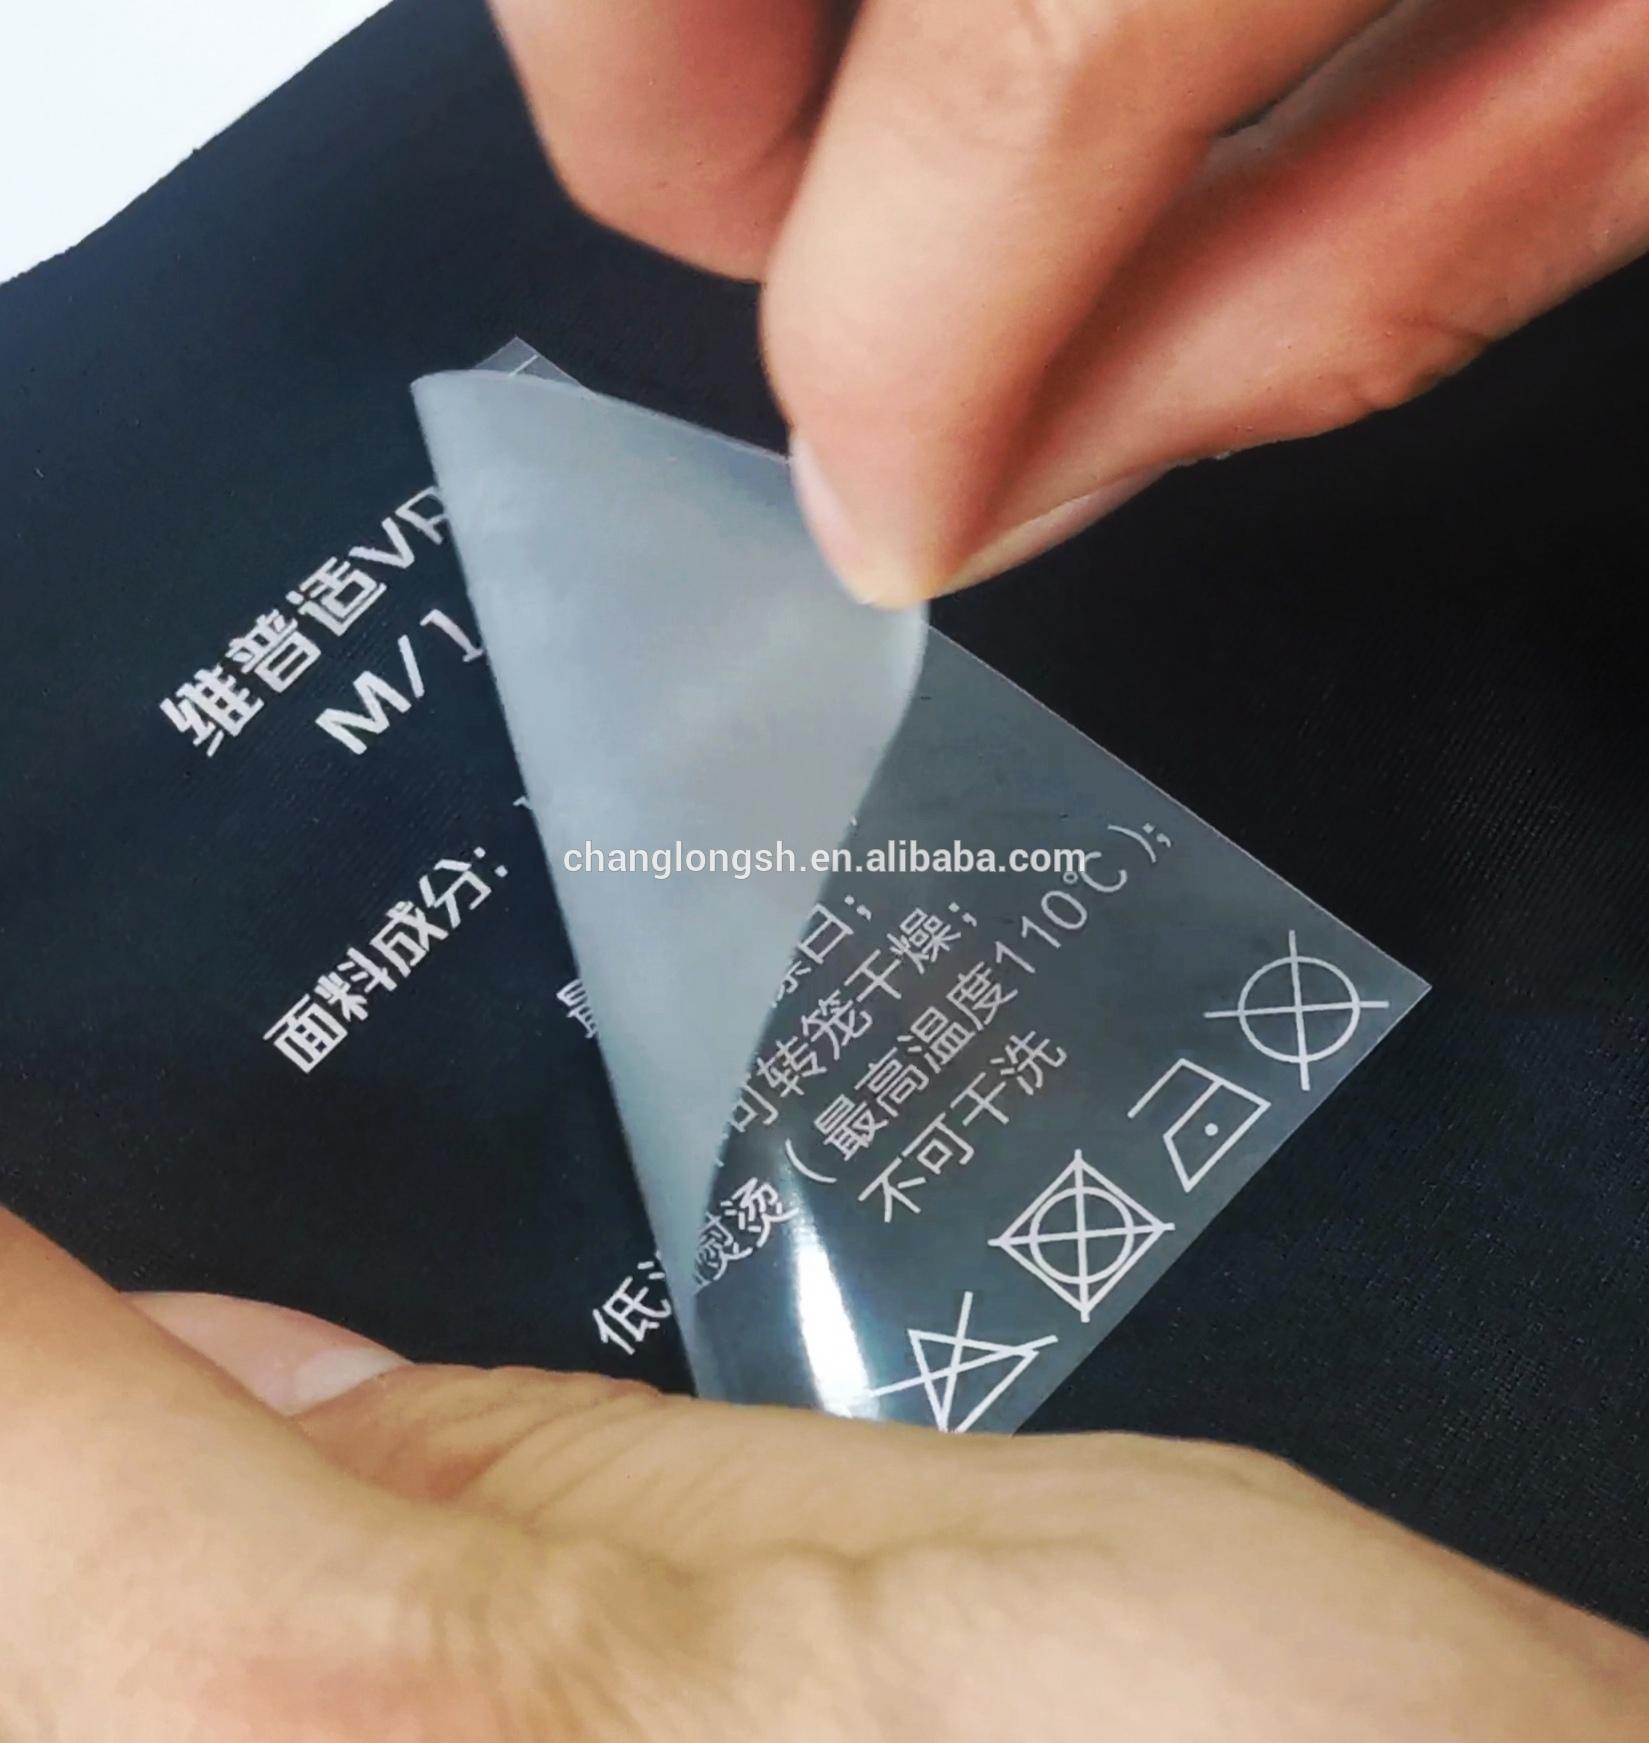 Custom iron on printable print film clothing label heat transfers for t-shirts transfer printing